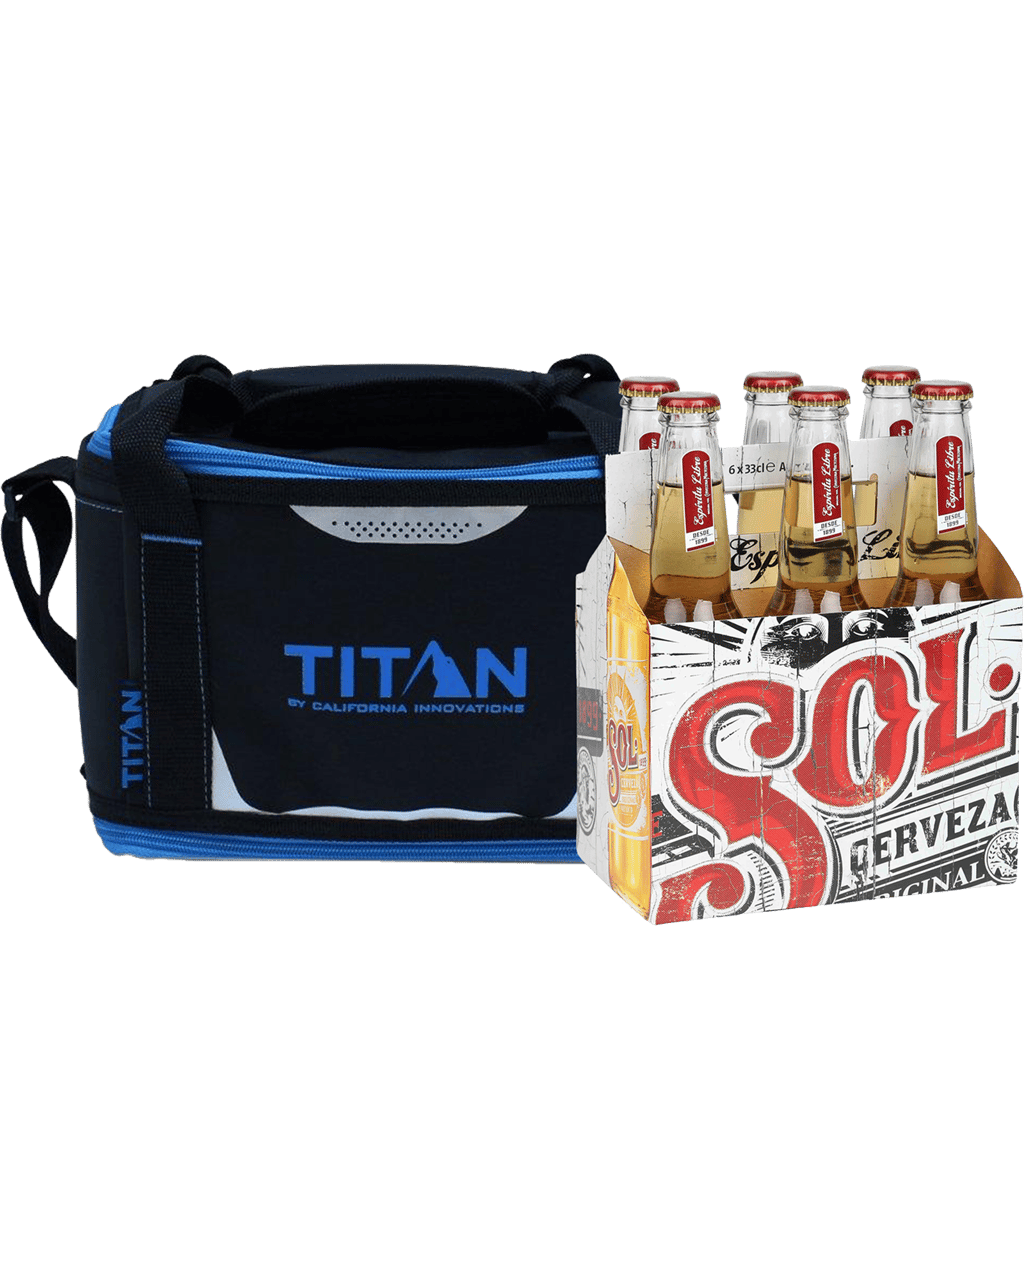 2c8ada4278b Titan & Sol Beer & Cooler Bundle   Dan Murphy's   Buy Wine ...